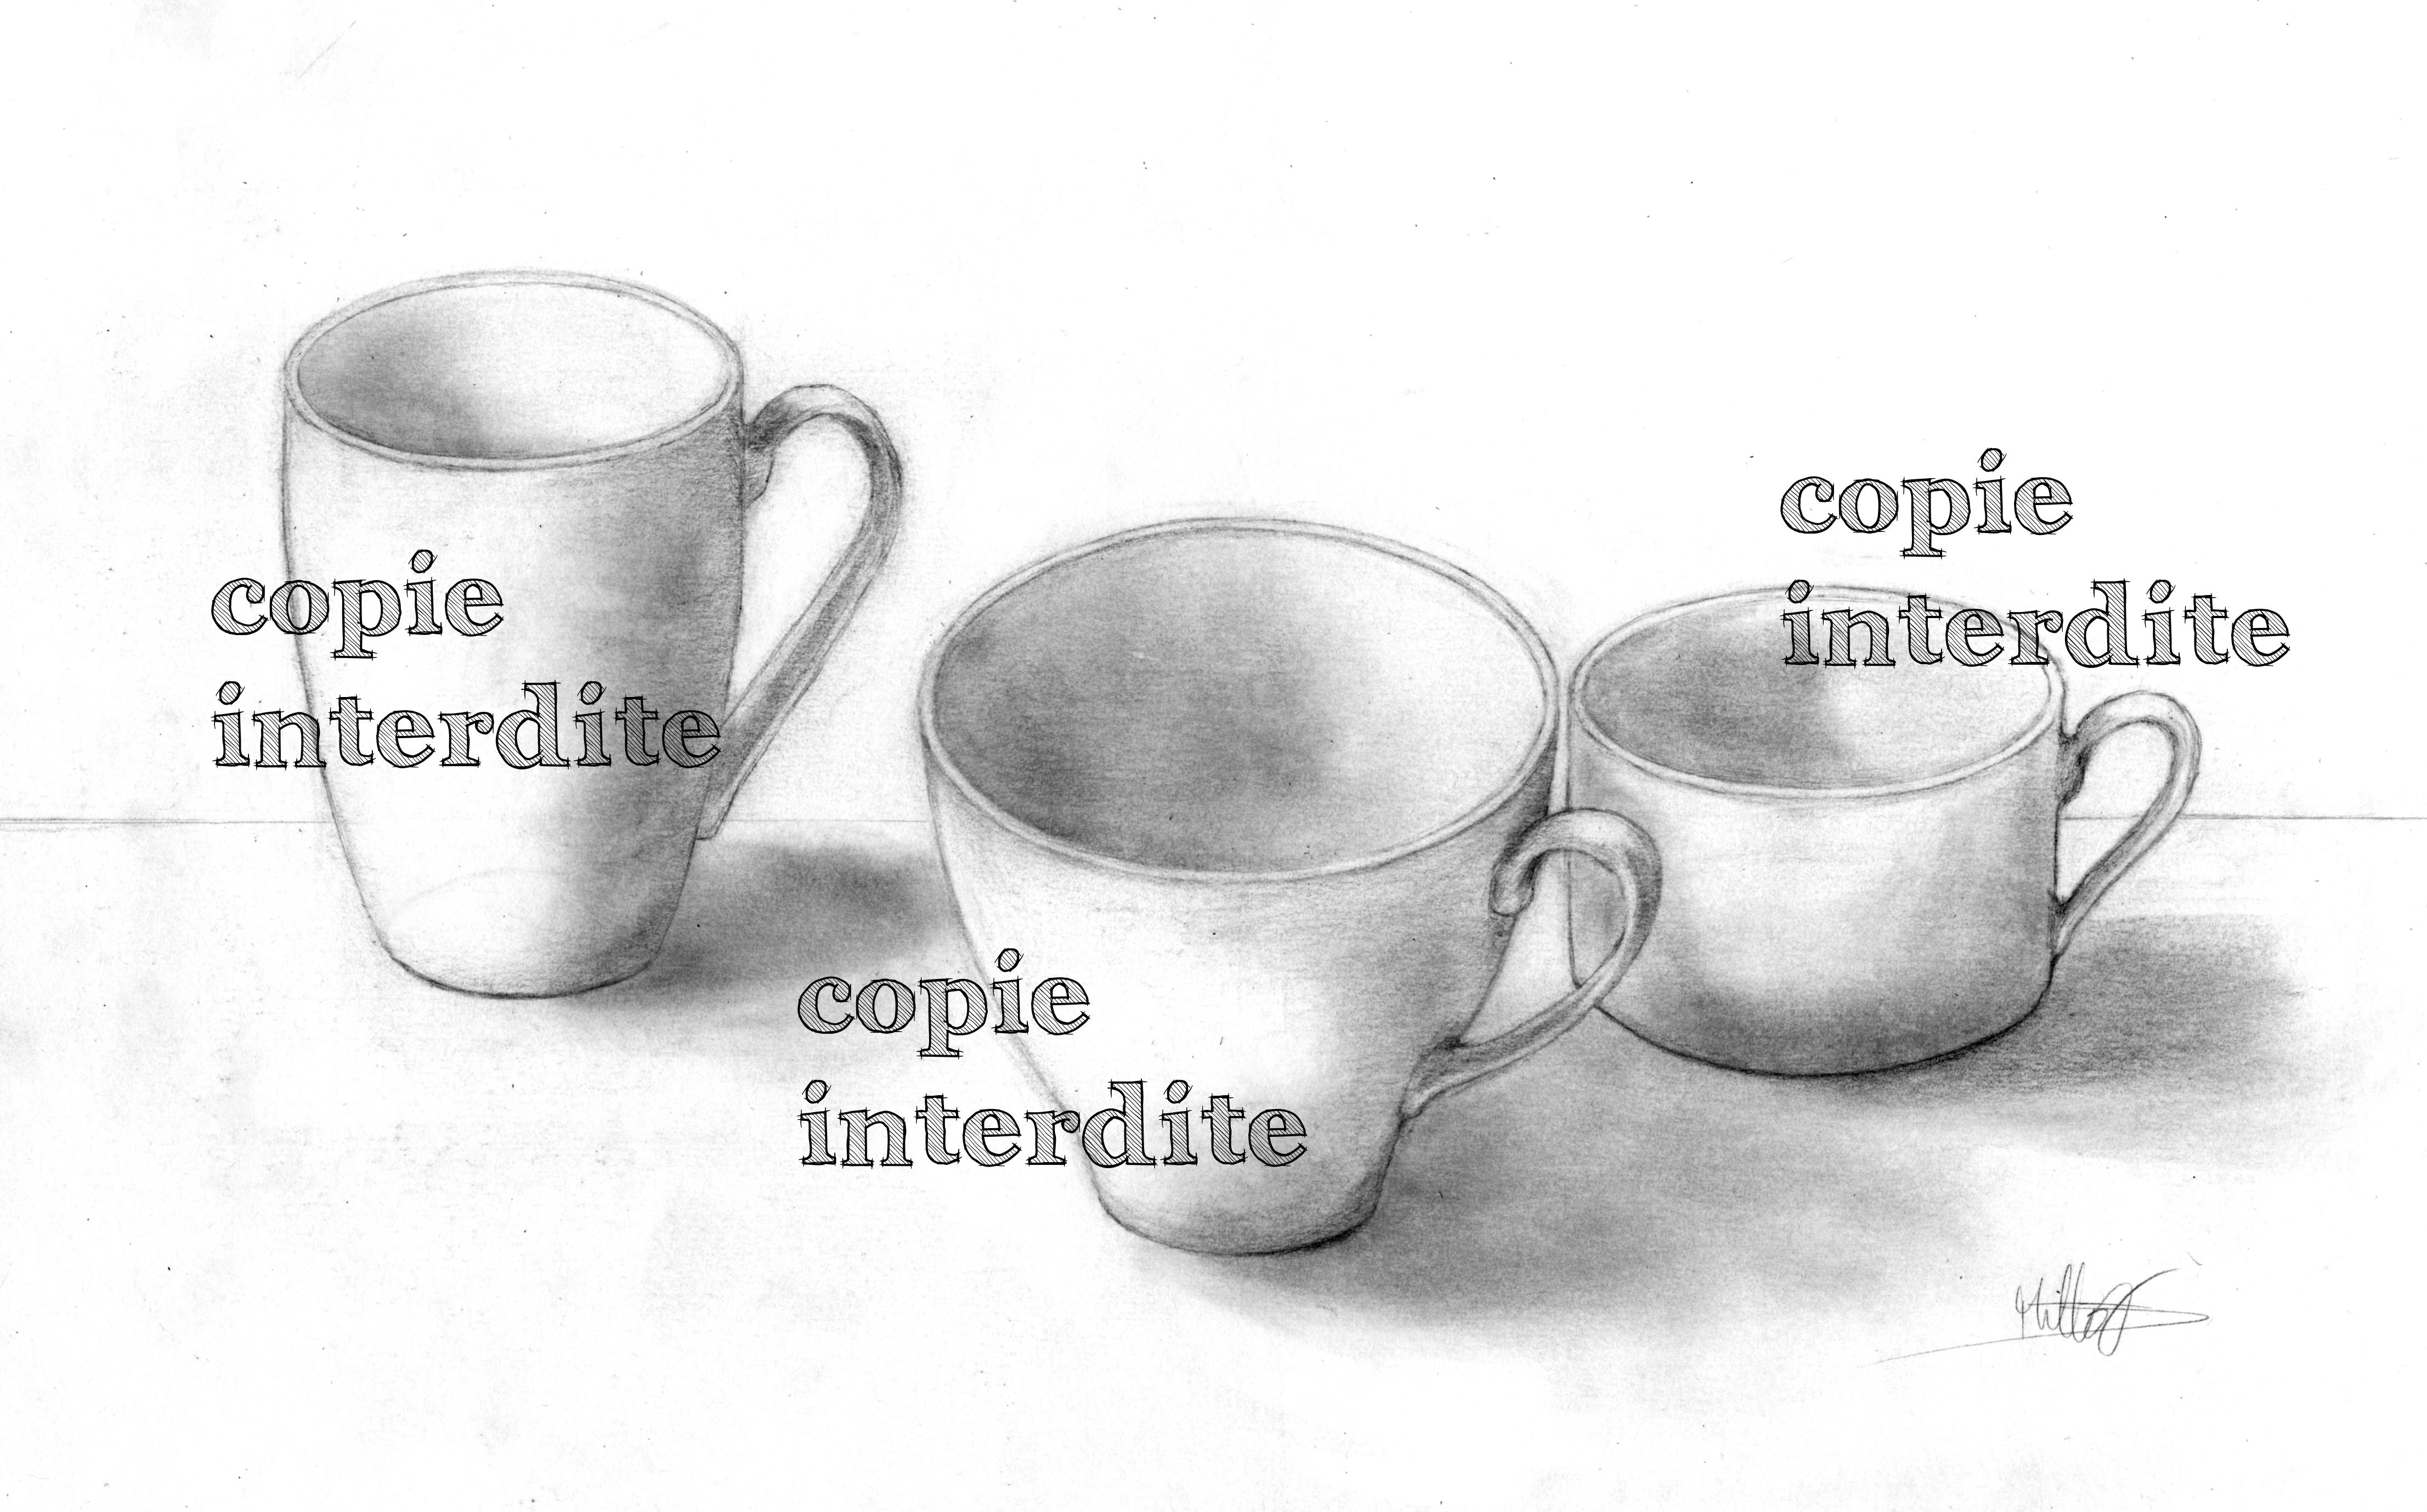 Les 3 tasses